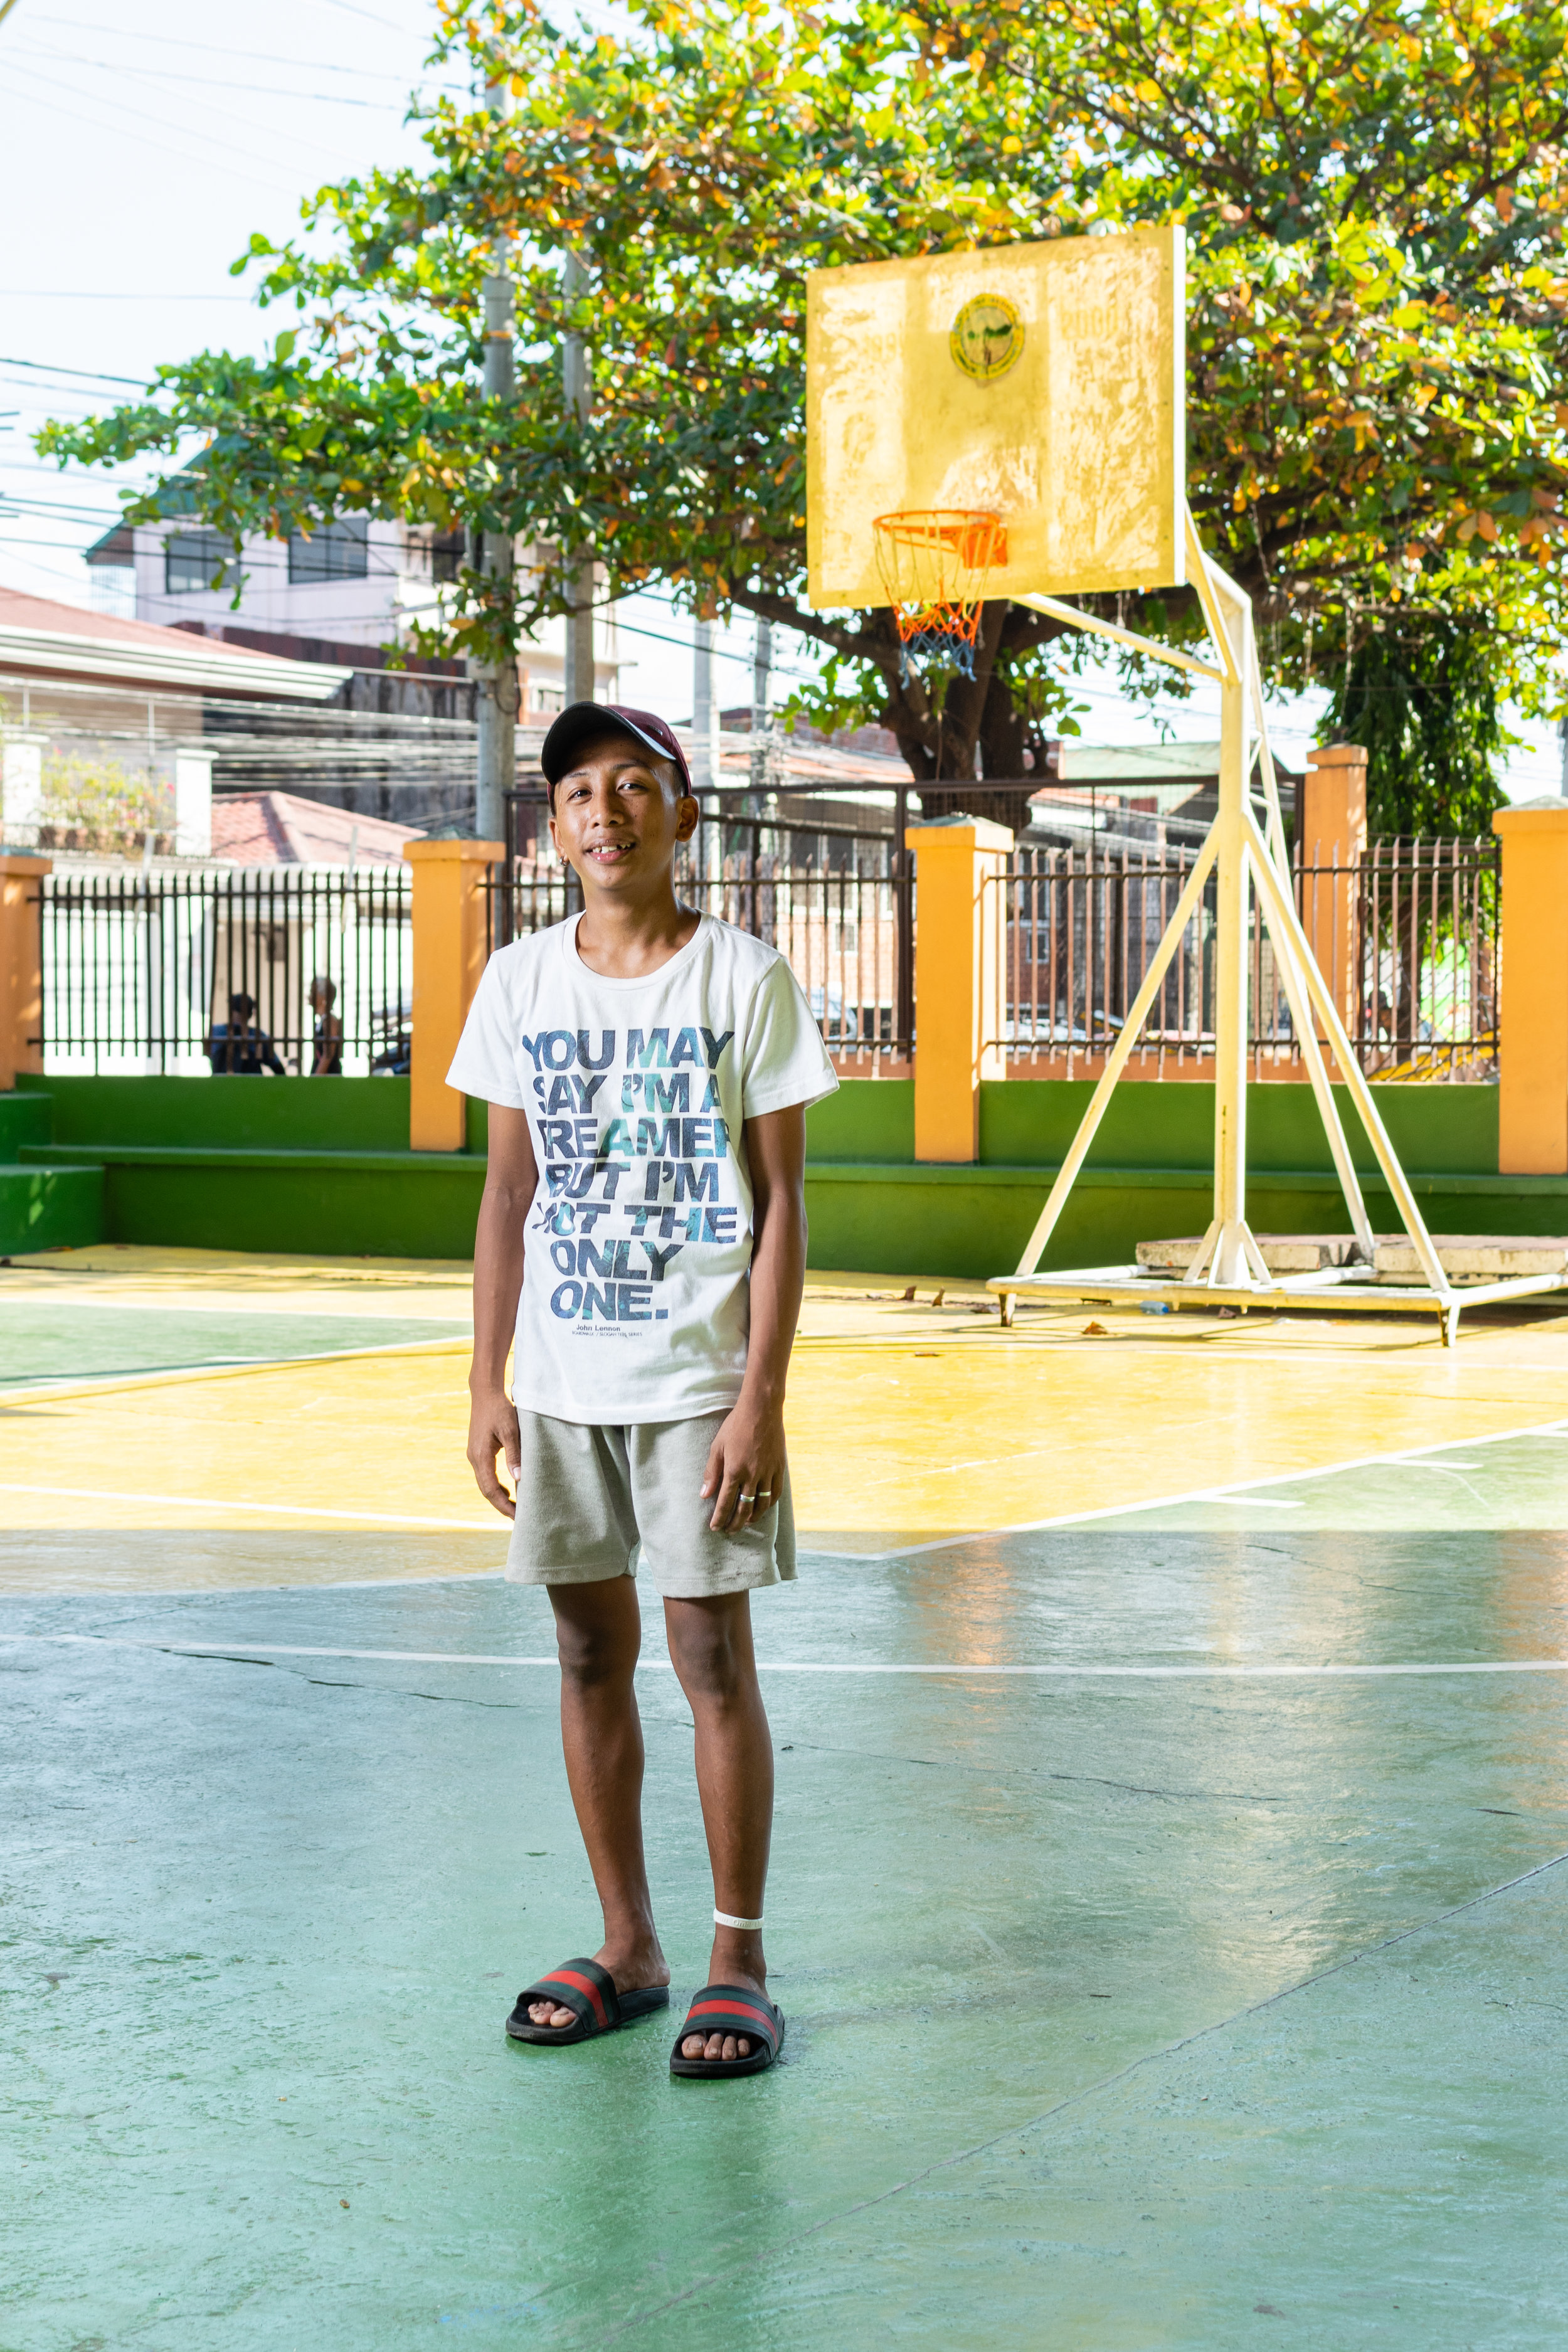 190312_Basketball_Portrait.jpg